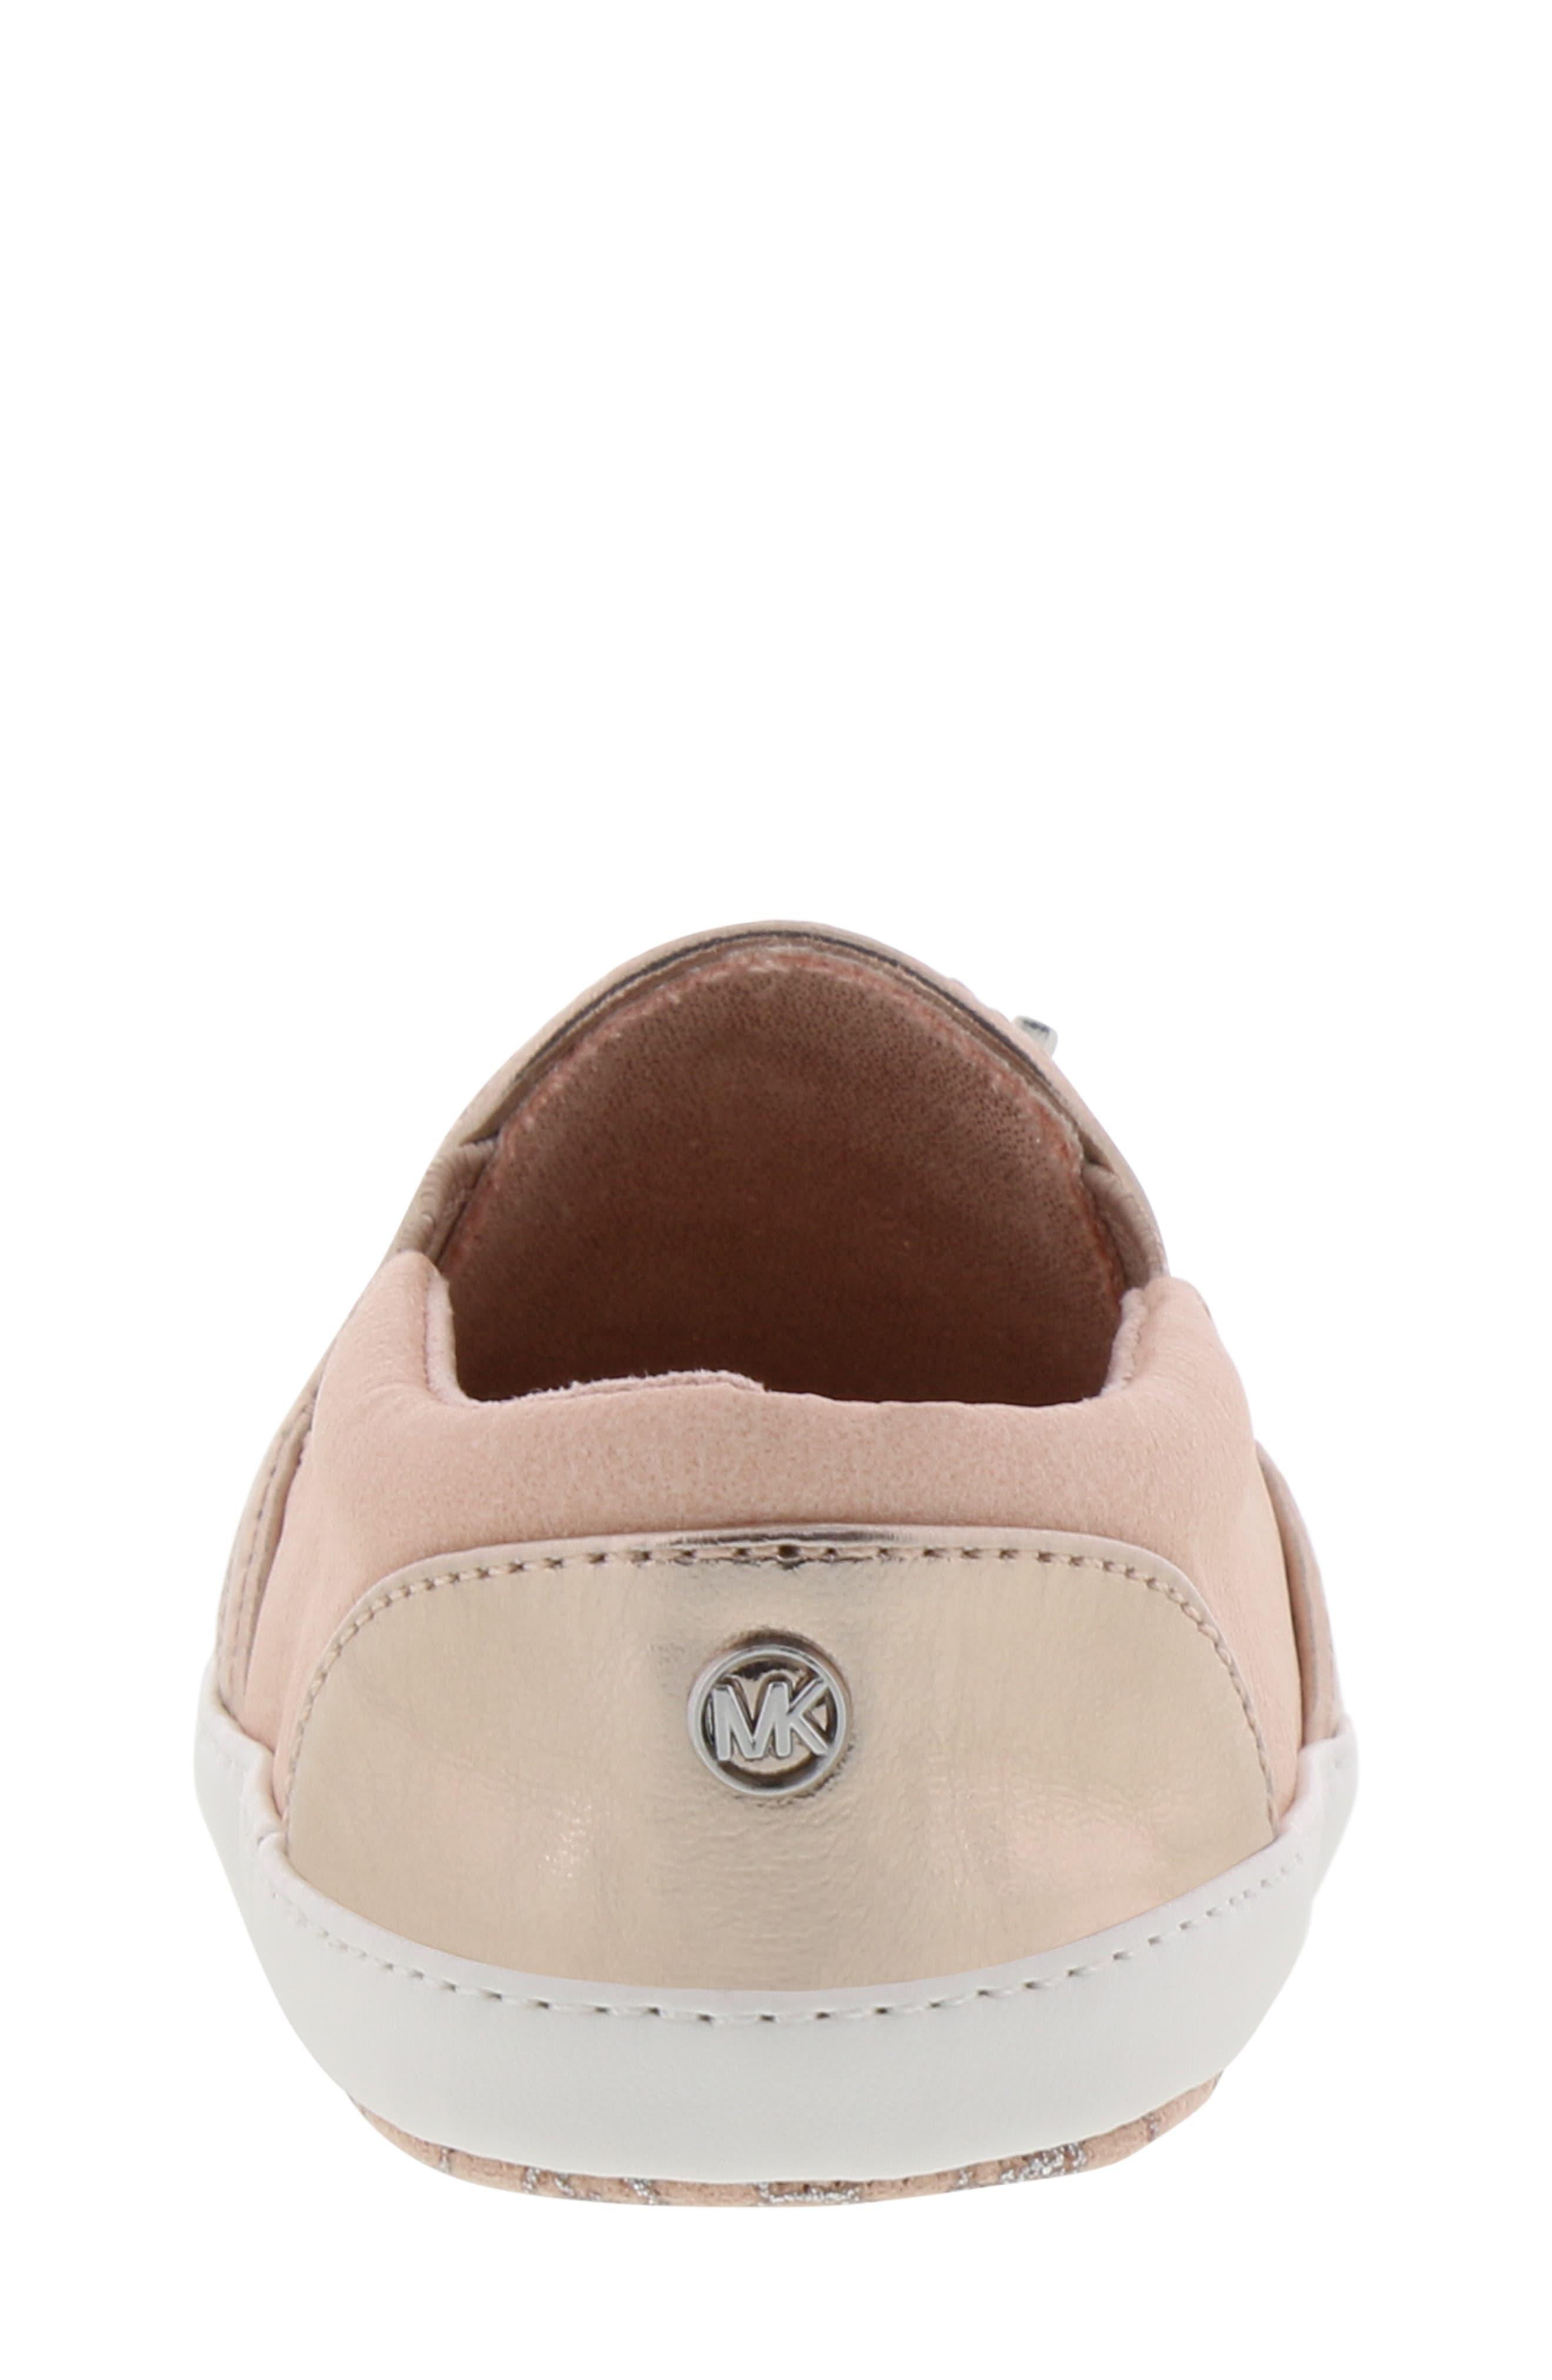 MICHAEL MICHAEL KORS, Magic Slip-On Sneaker, Alternate thumbnail 7, color, BLUSH